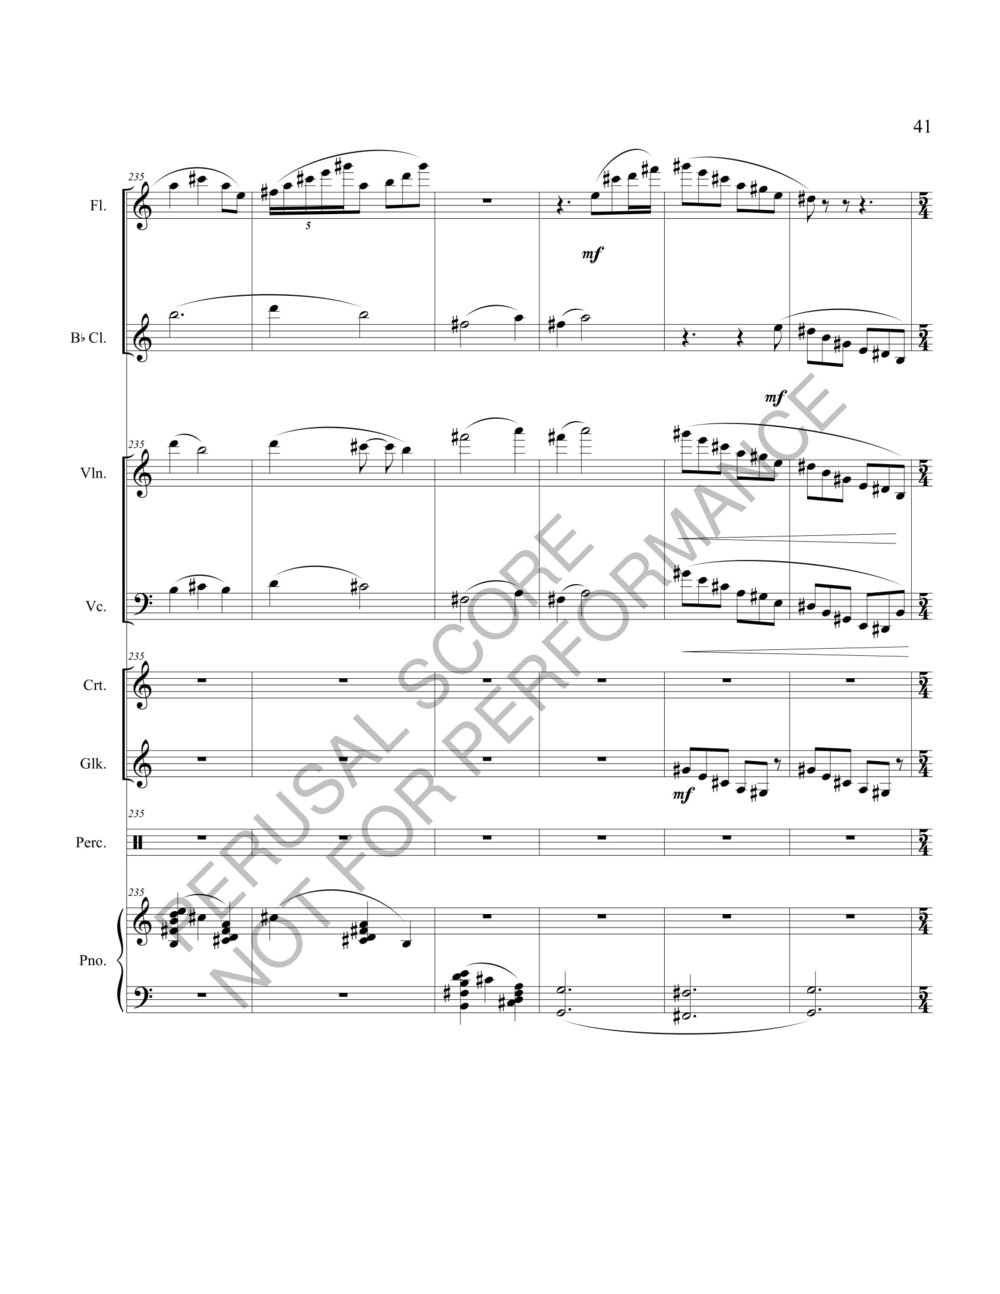 Boyd Terra Liberi Score-watermark-47.jpg